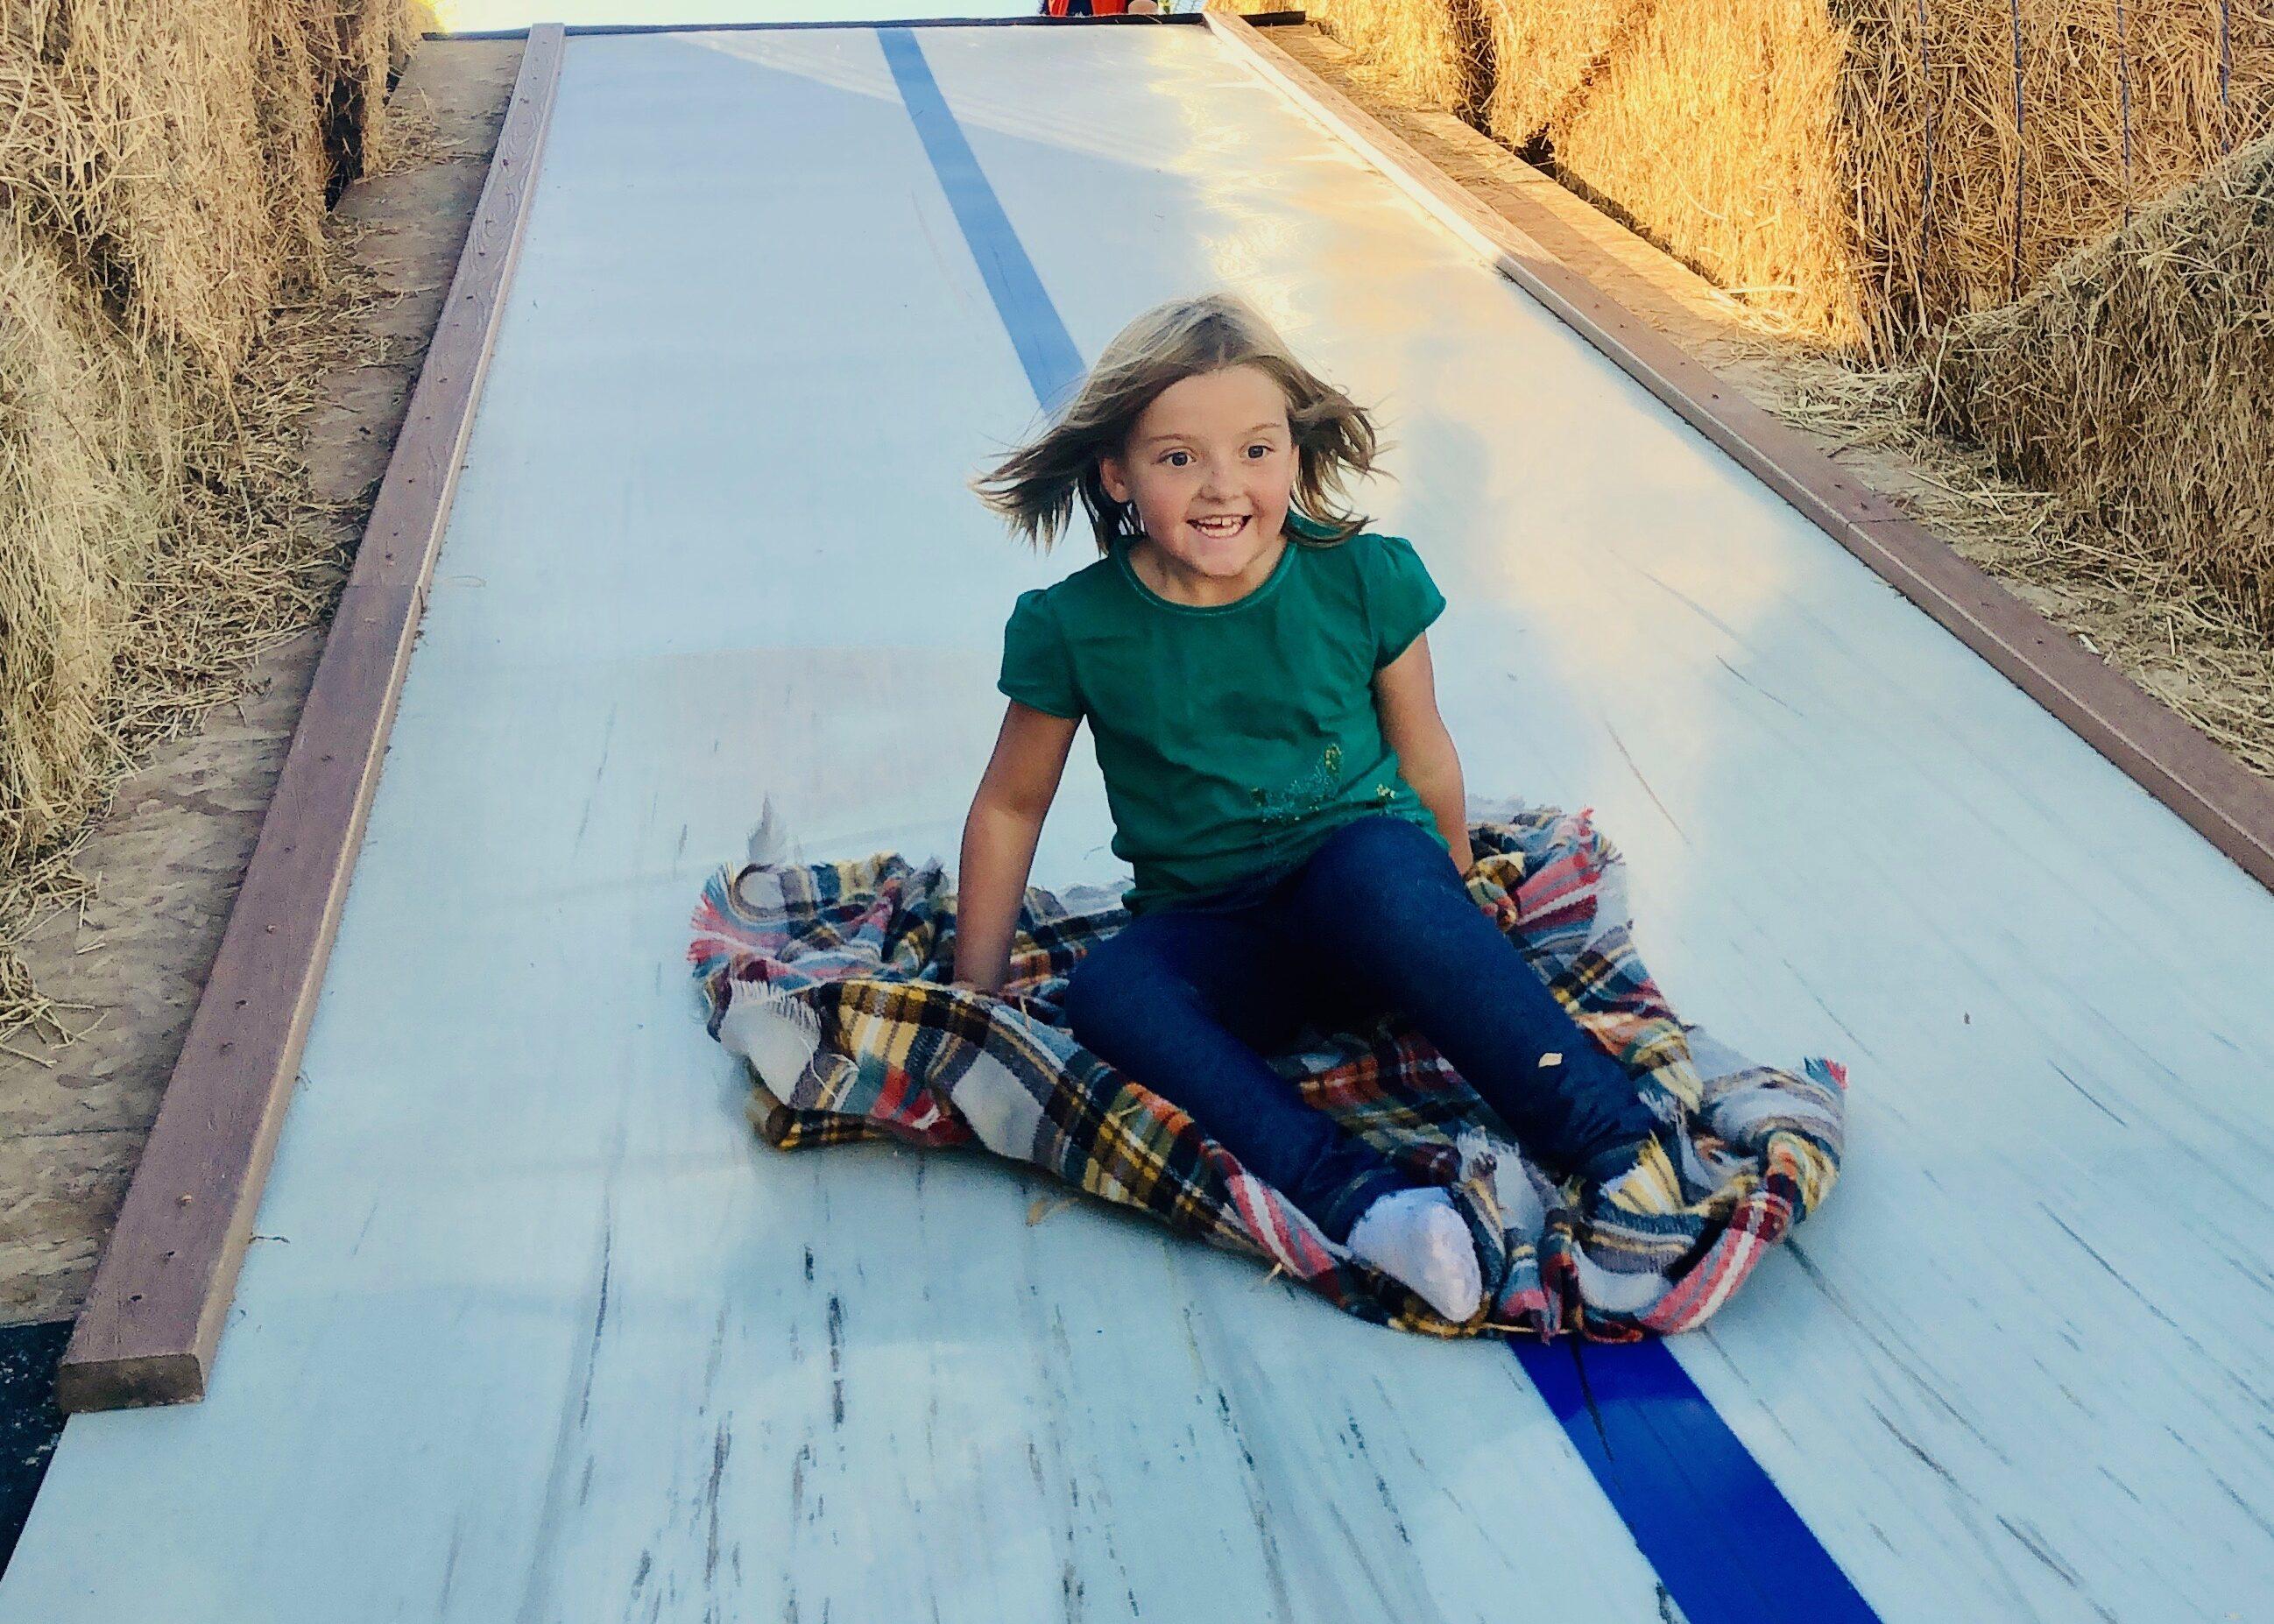 Glen Rays Corn Maze Super Slide - Giant 50 ft slide at corn maze